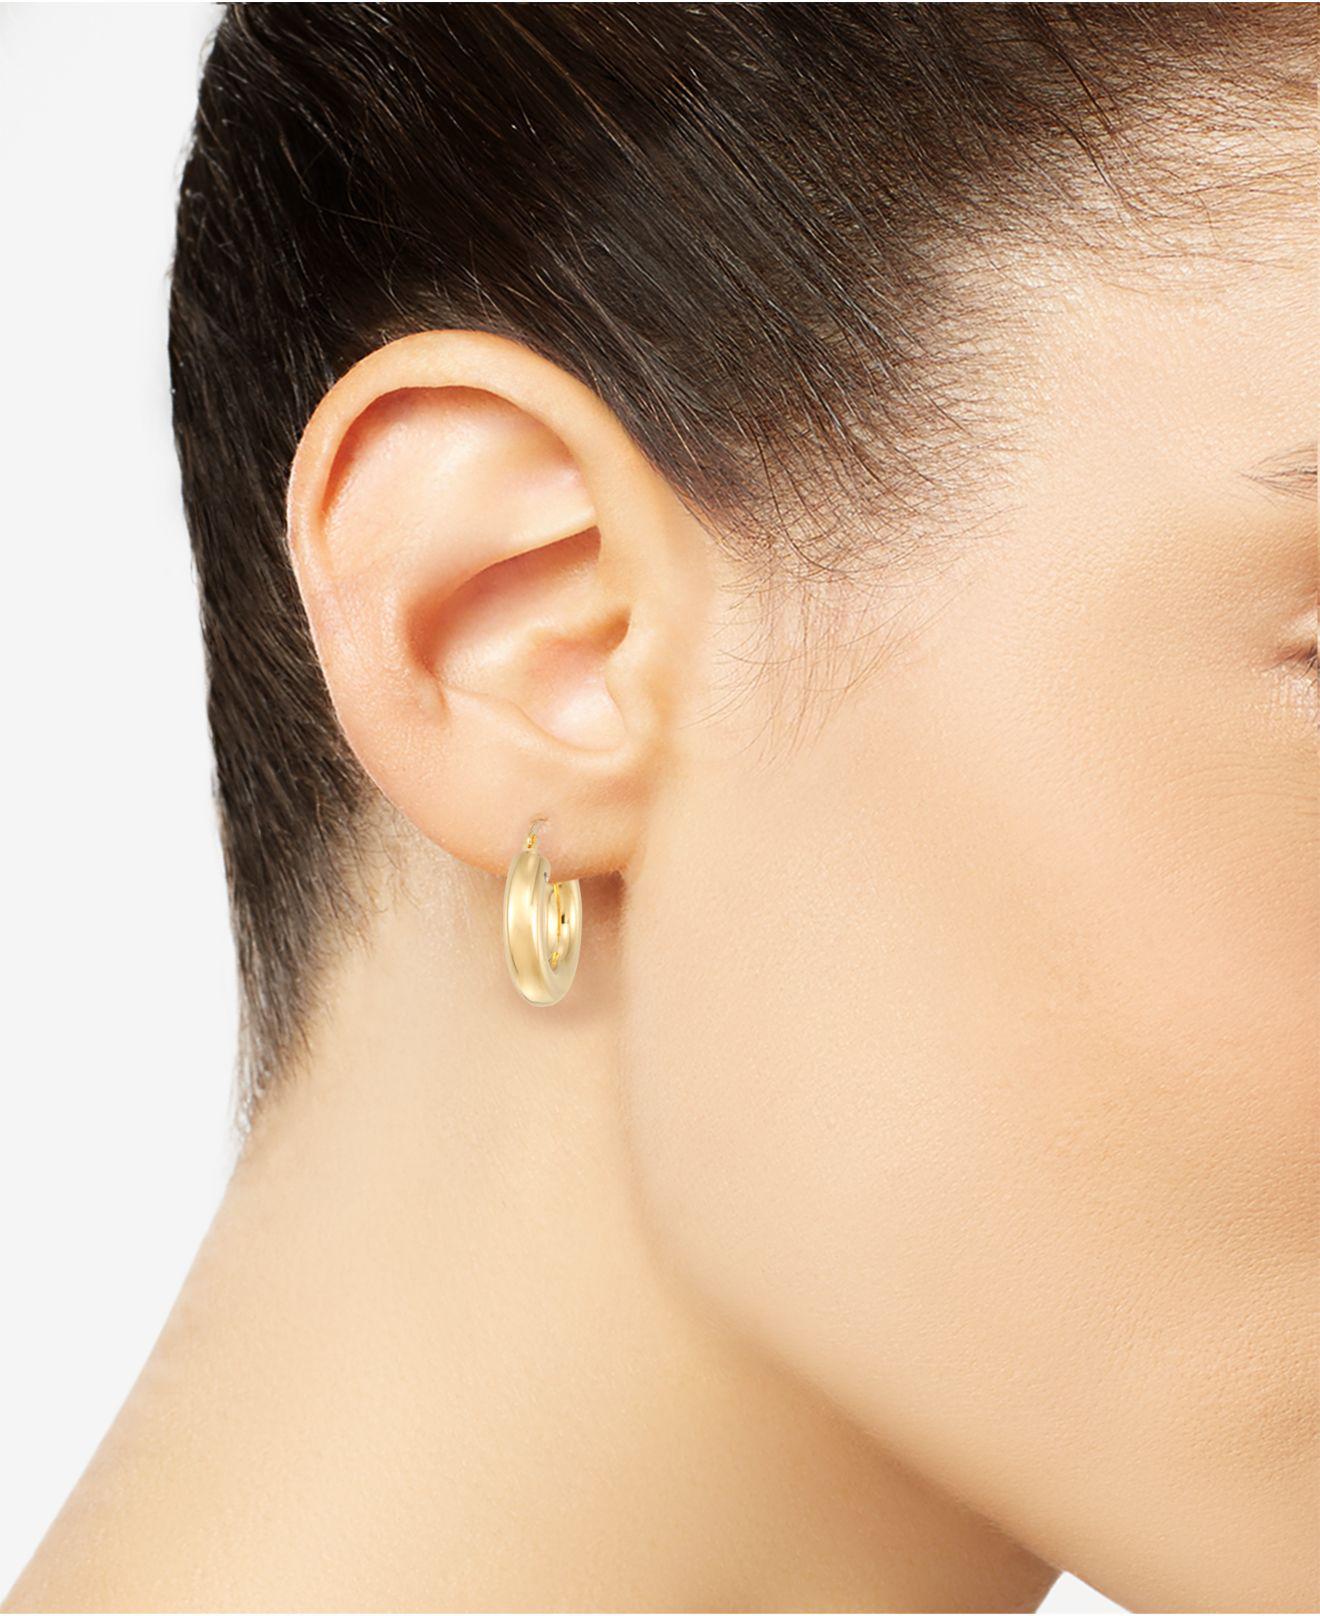 Lyst Signature Gold Diamond Accent Huggie Hoop Earrings In 14k